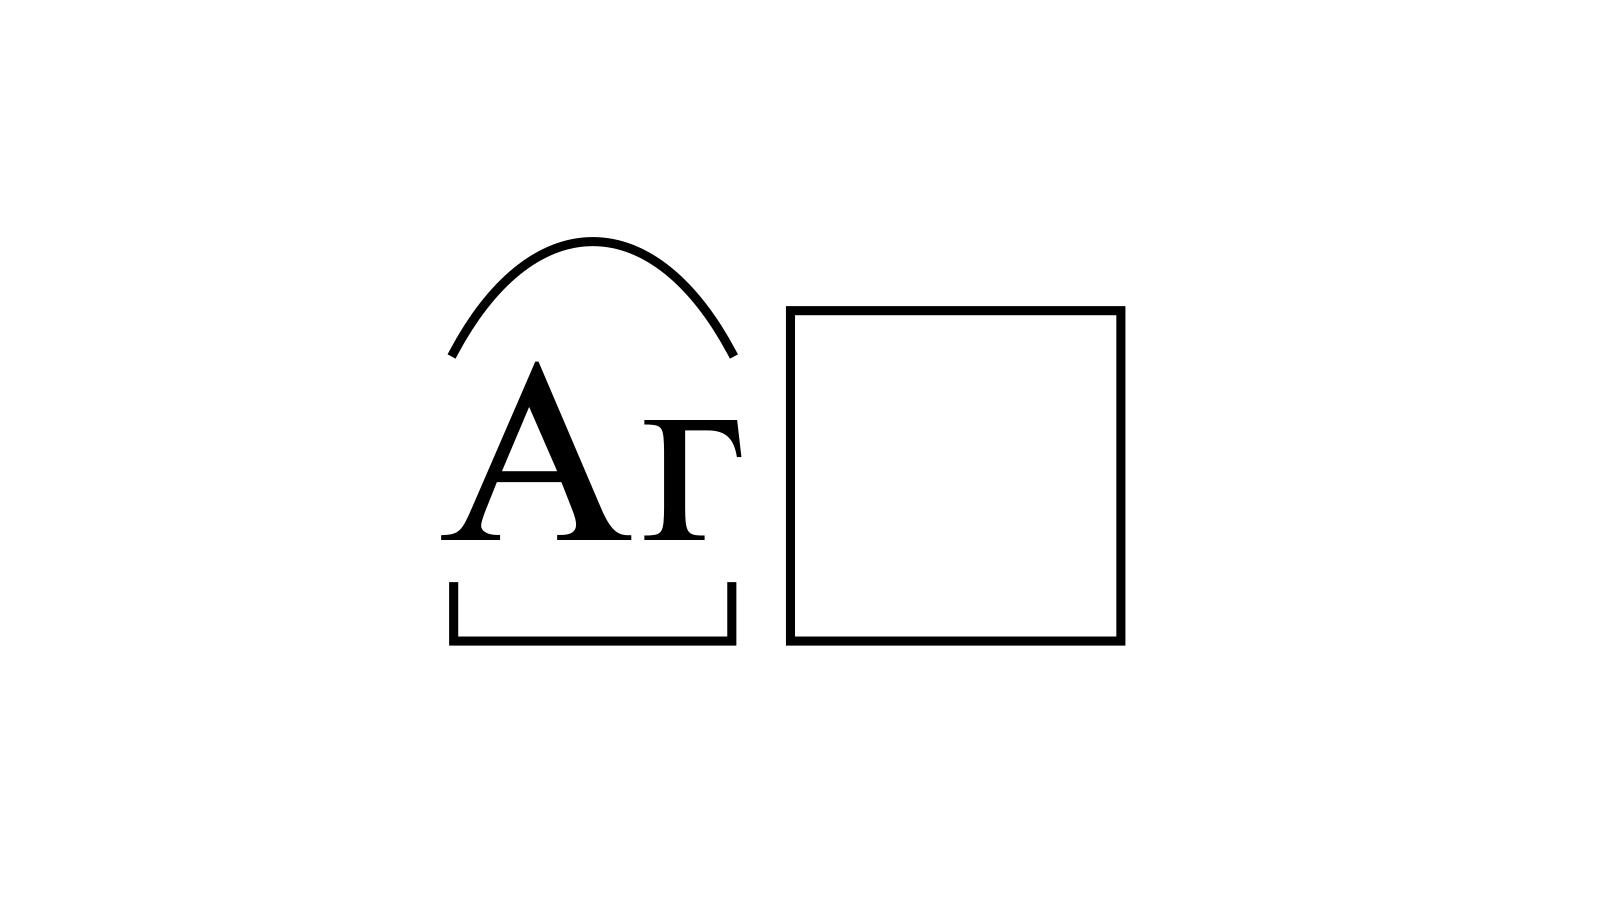 Разбор слова «Аг» по составу